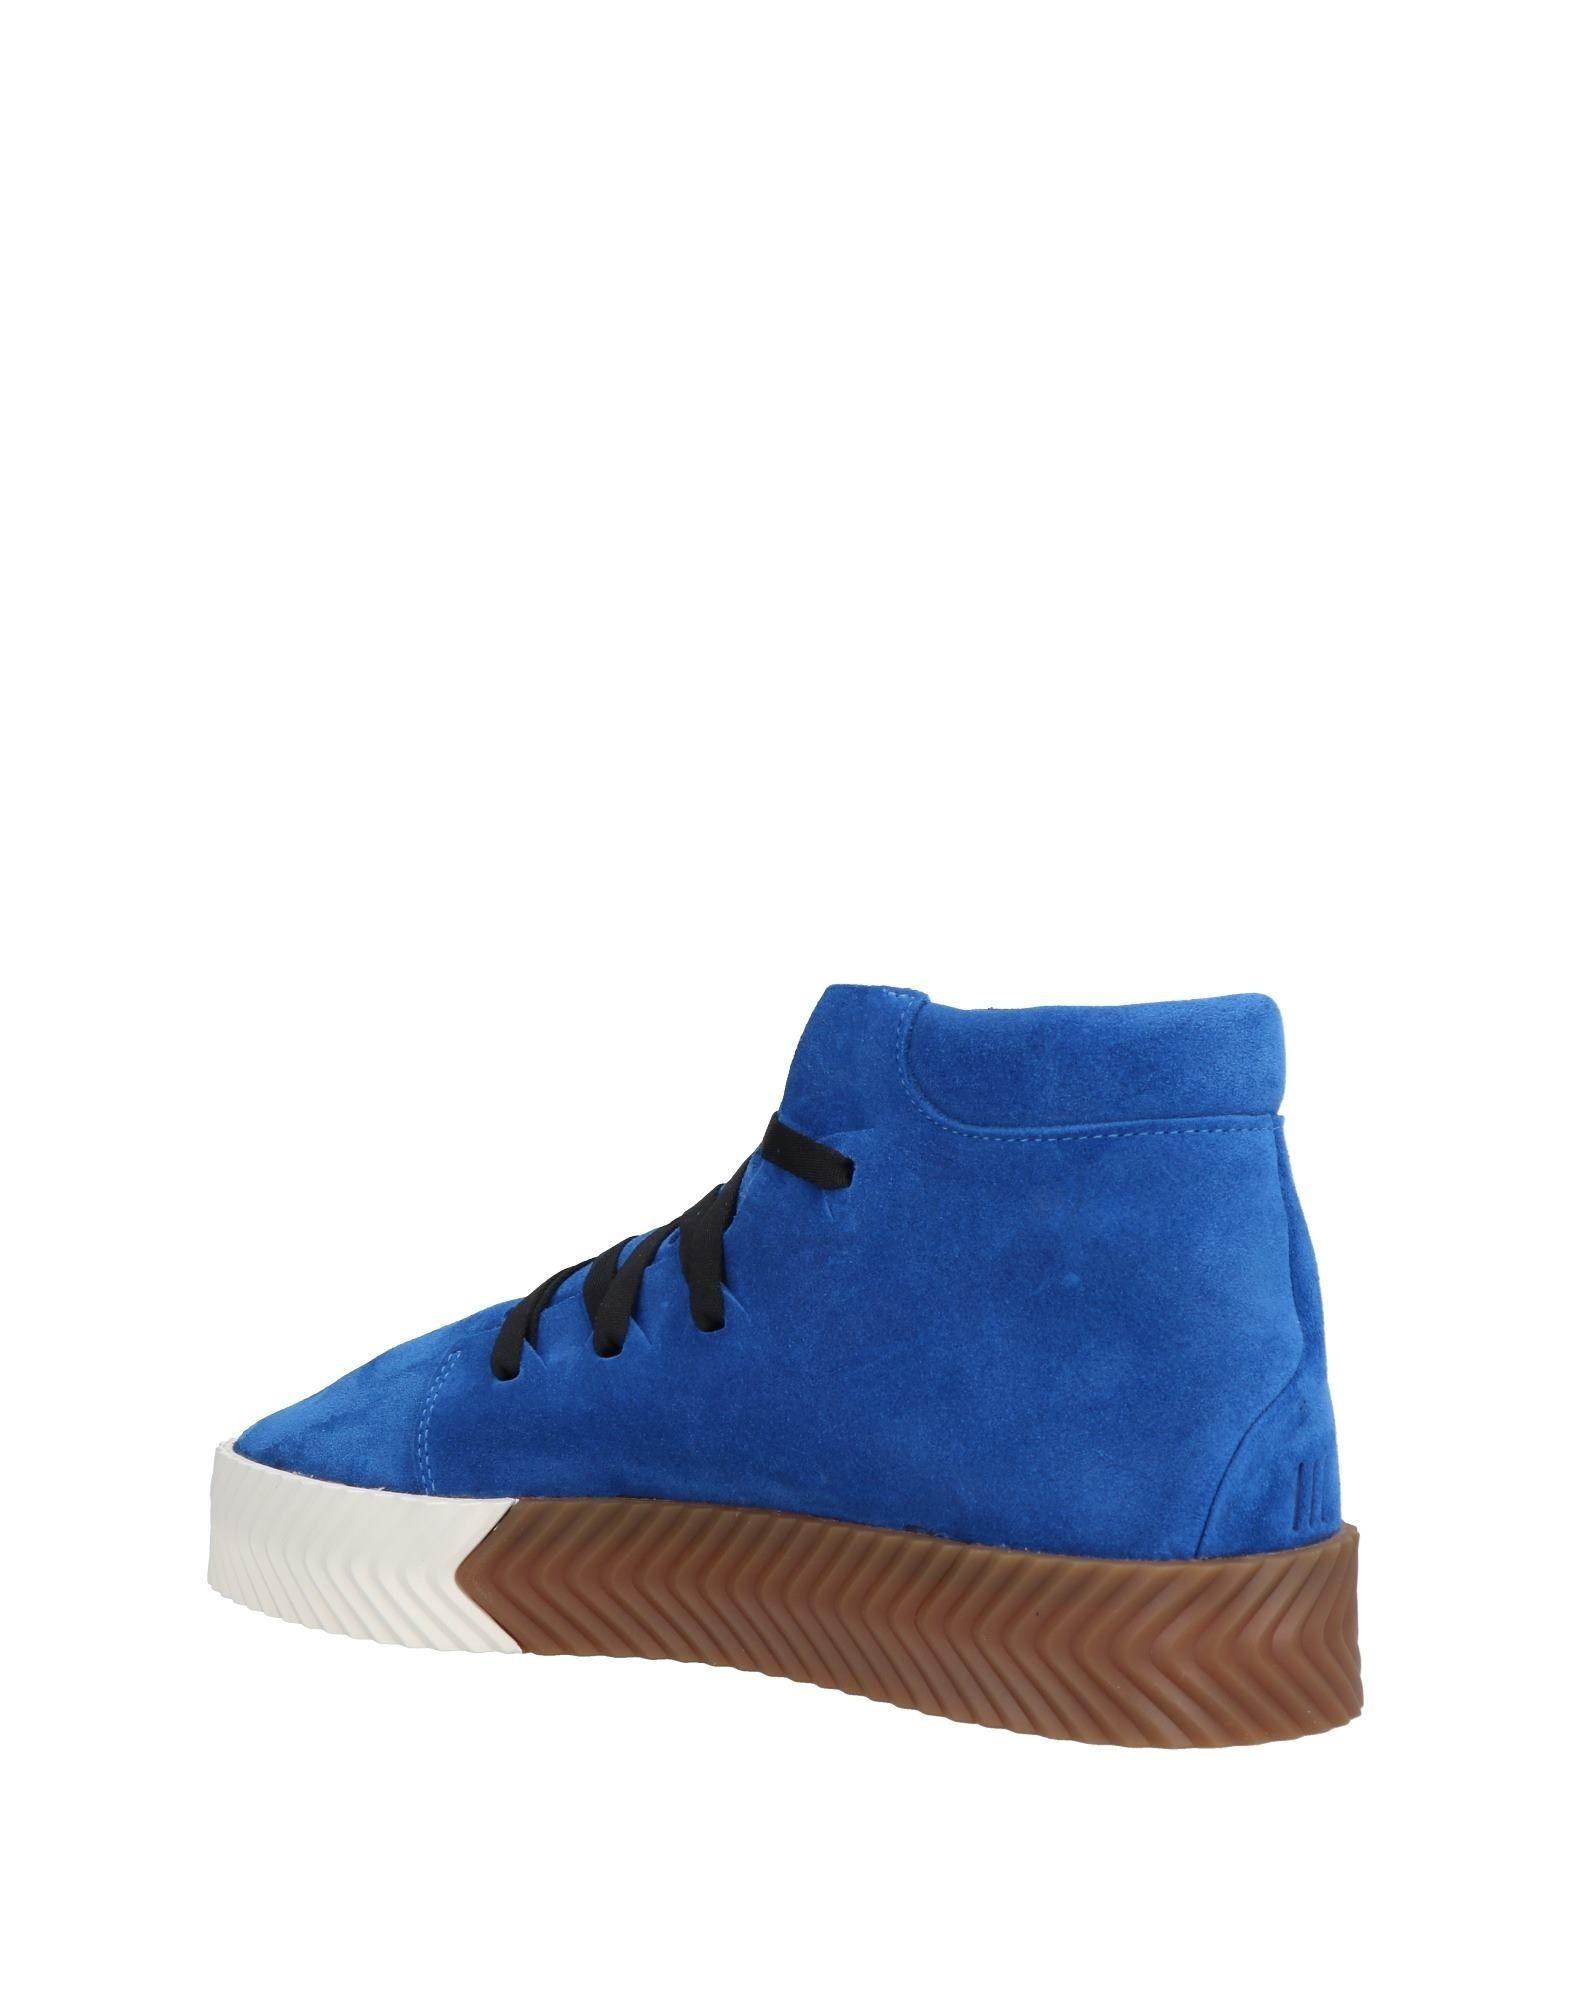 Adidas Schuhe Sneakers Herren  11493211QG Heiße Schuhe Adidas 0ba26c